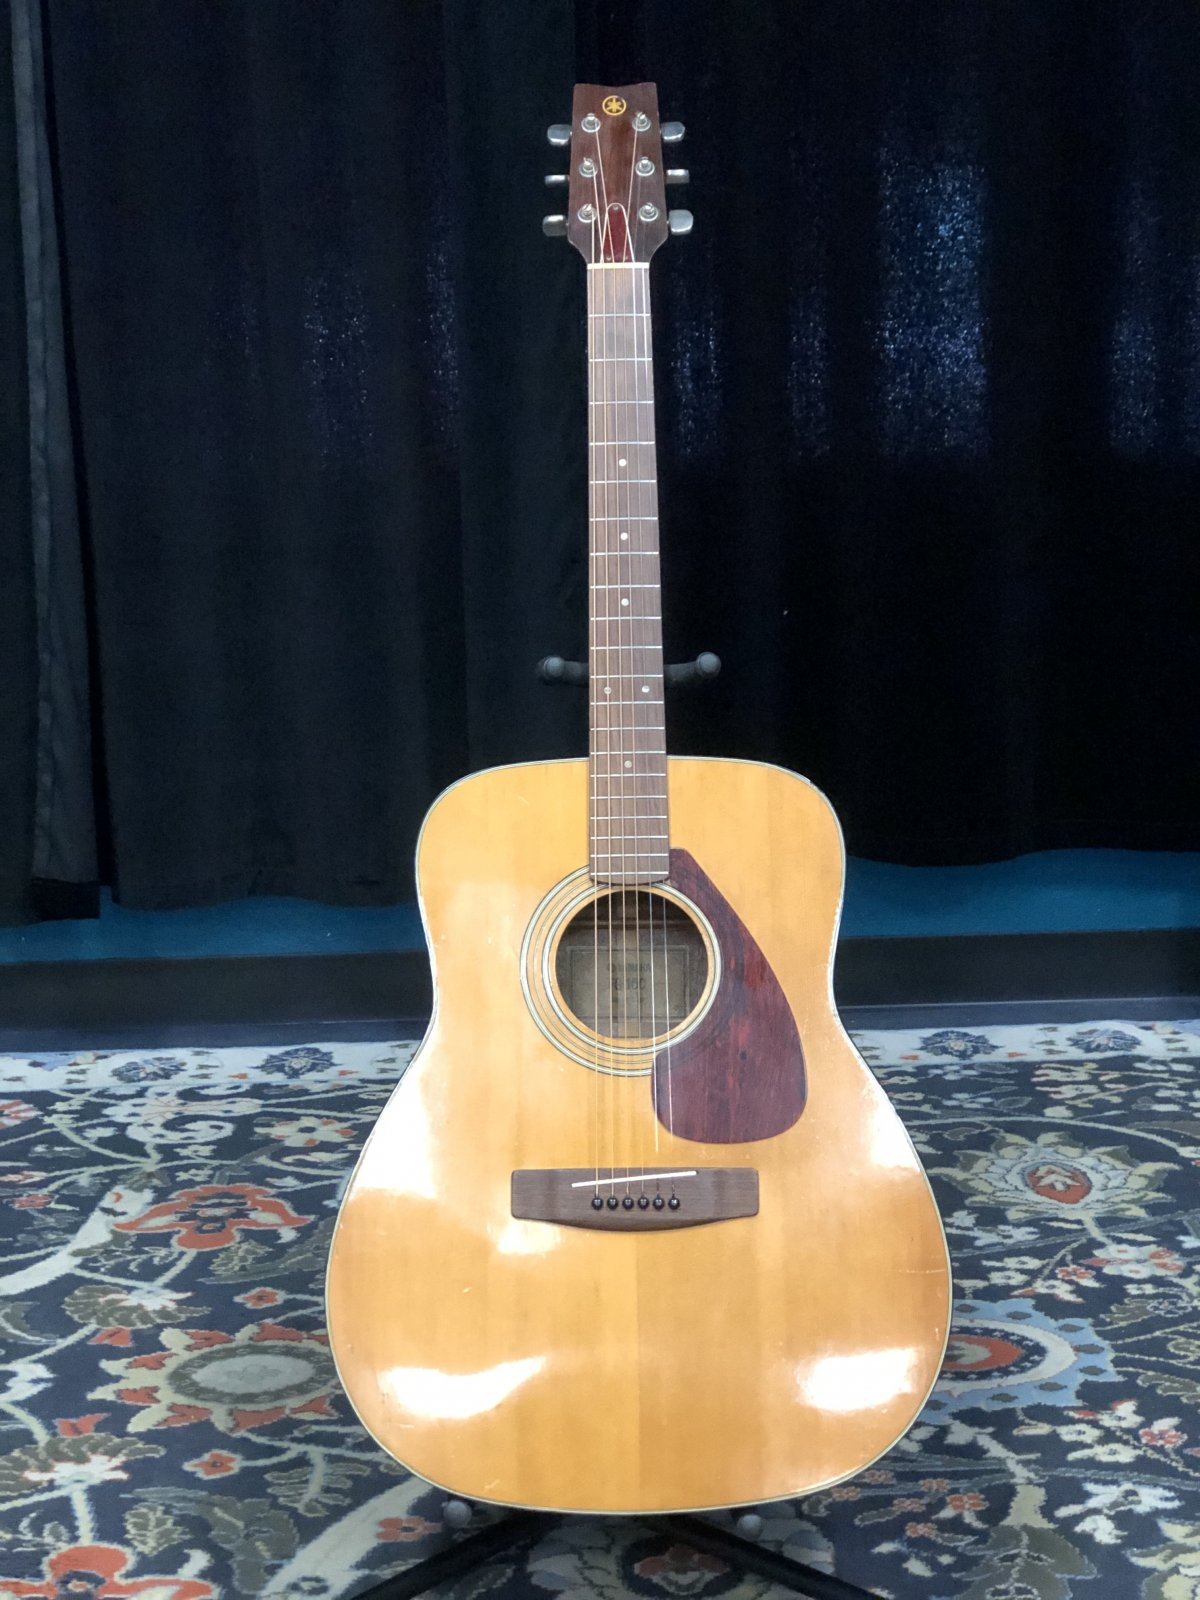 Preowned Yamaha FG-160 Acoustic Guitar